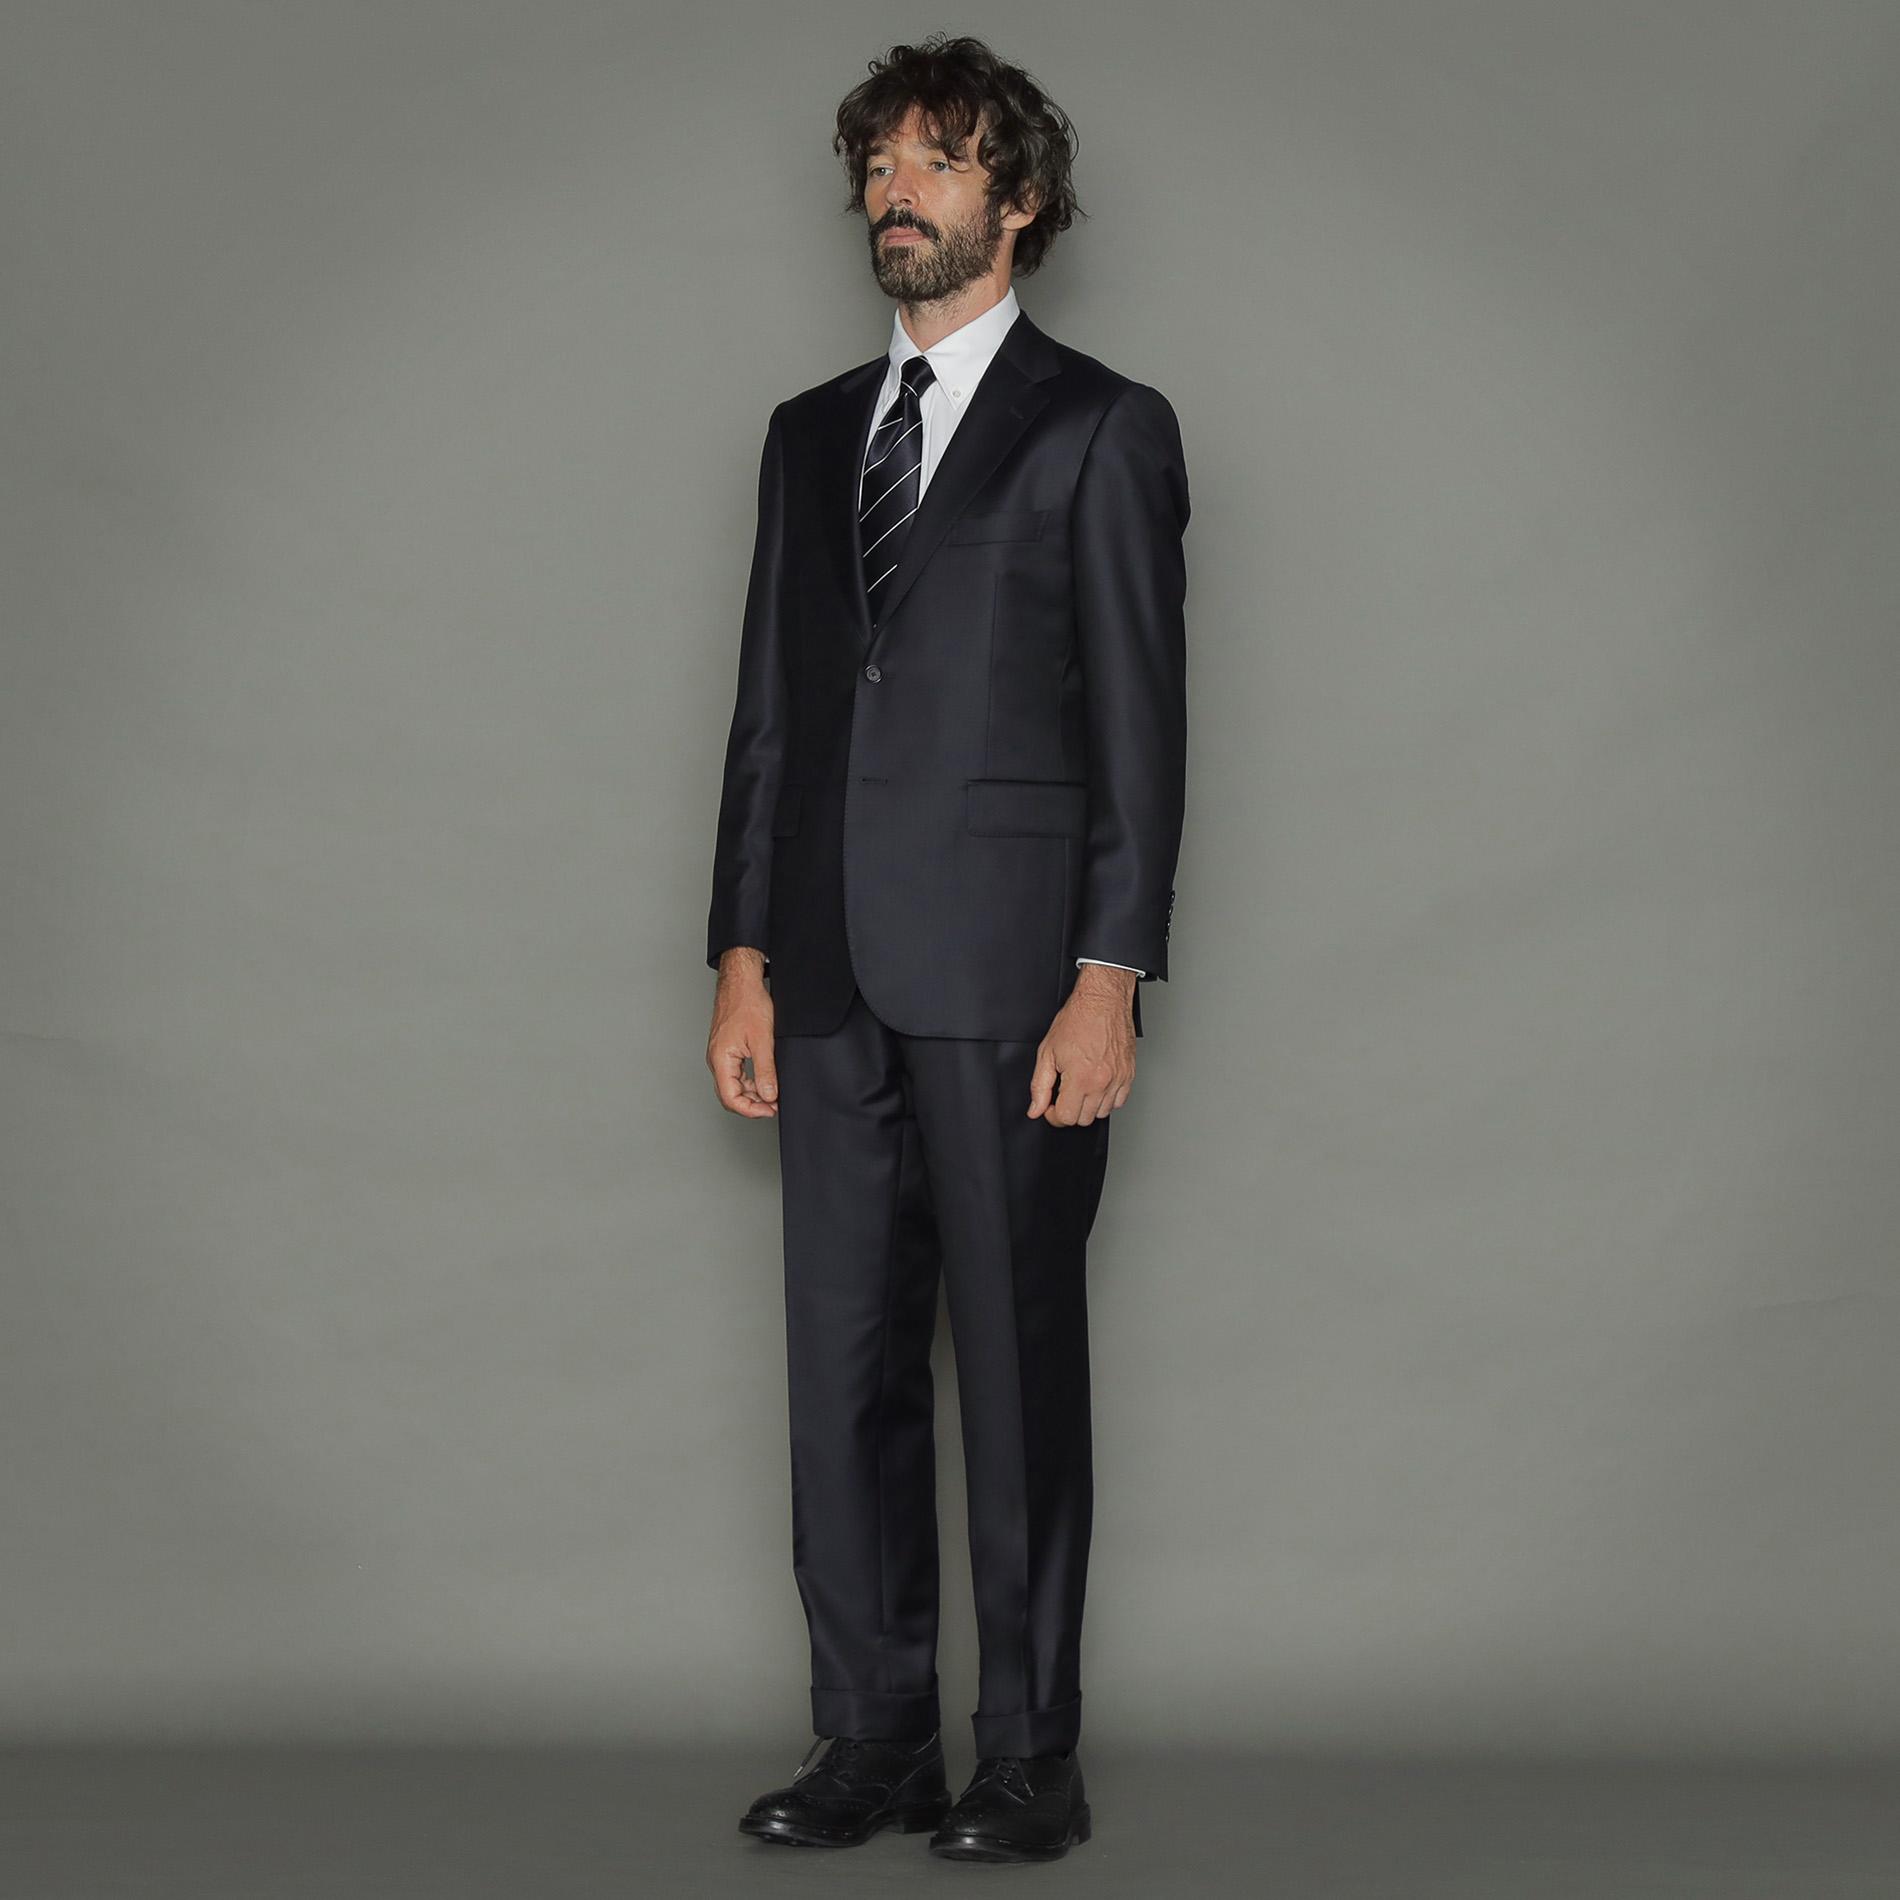 【OX BRIDGE】【Loro Piana/ロロ・ピアーナ】ツイル無地スーツ